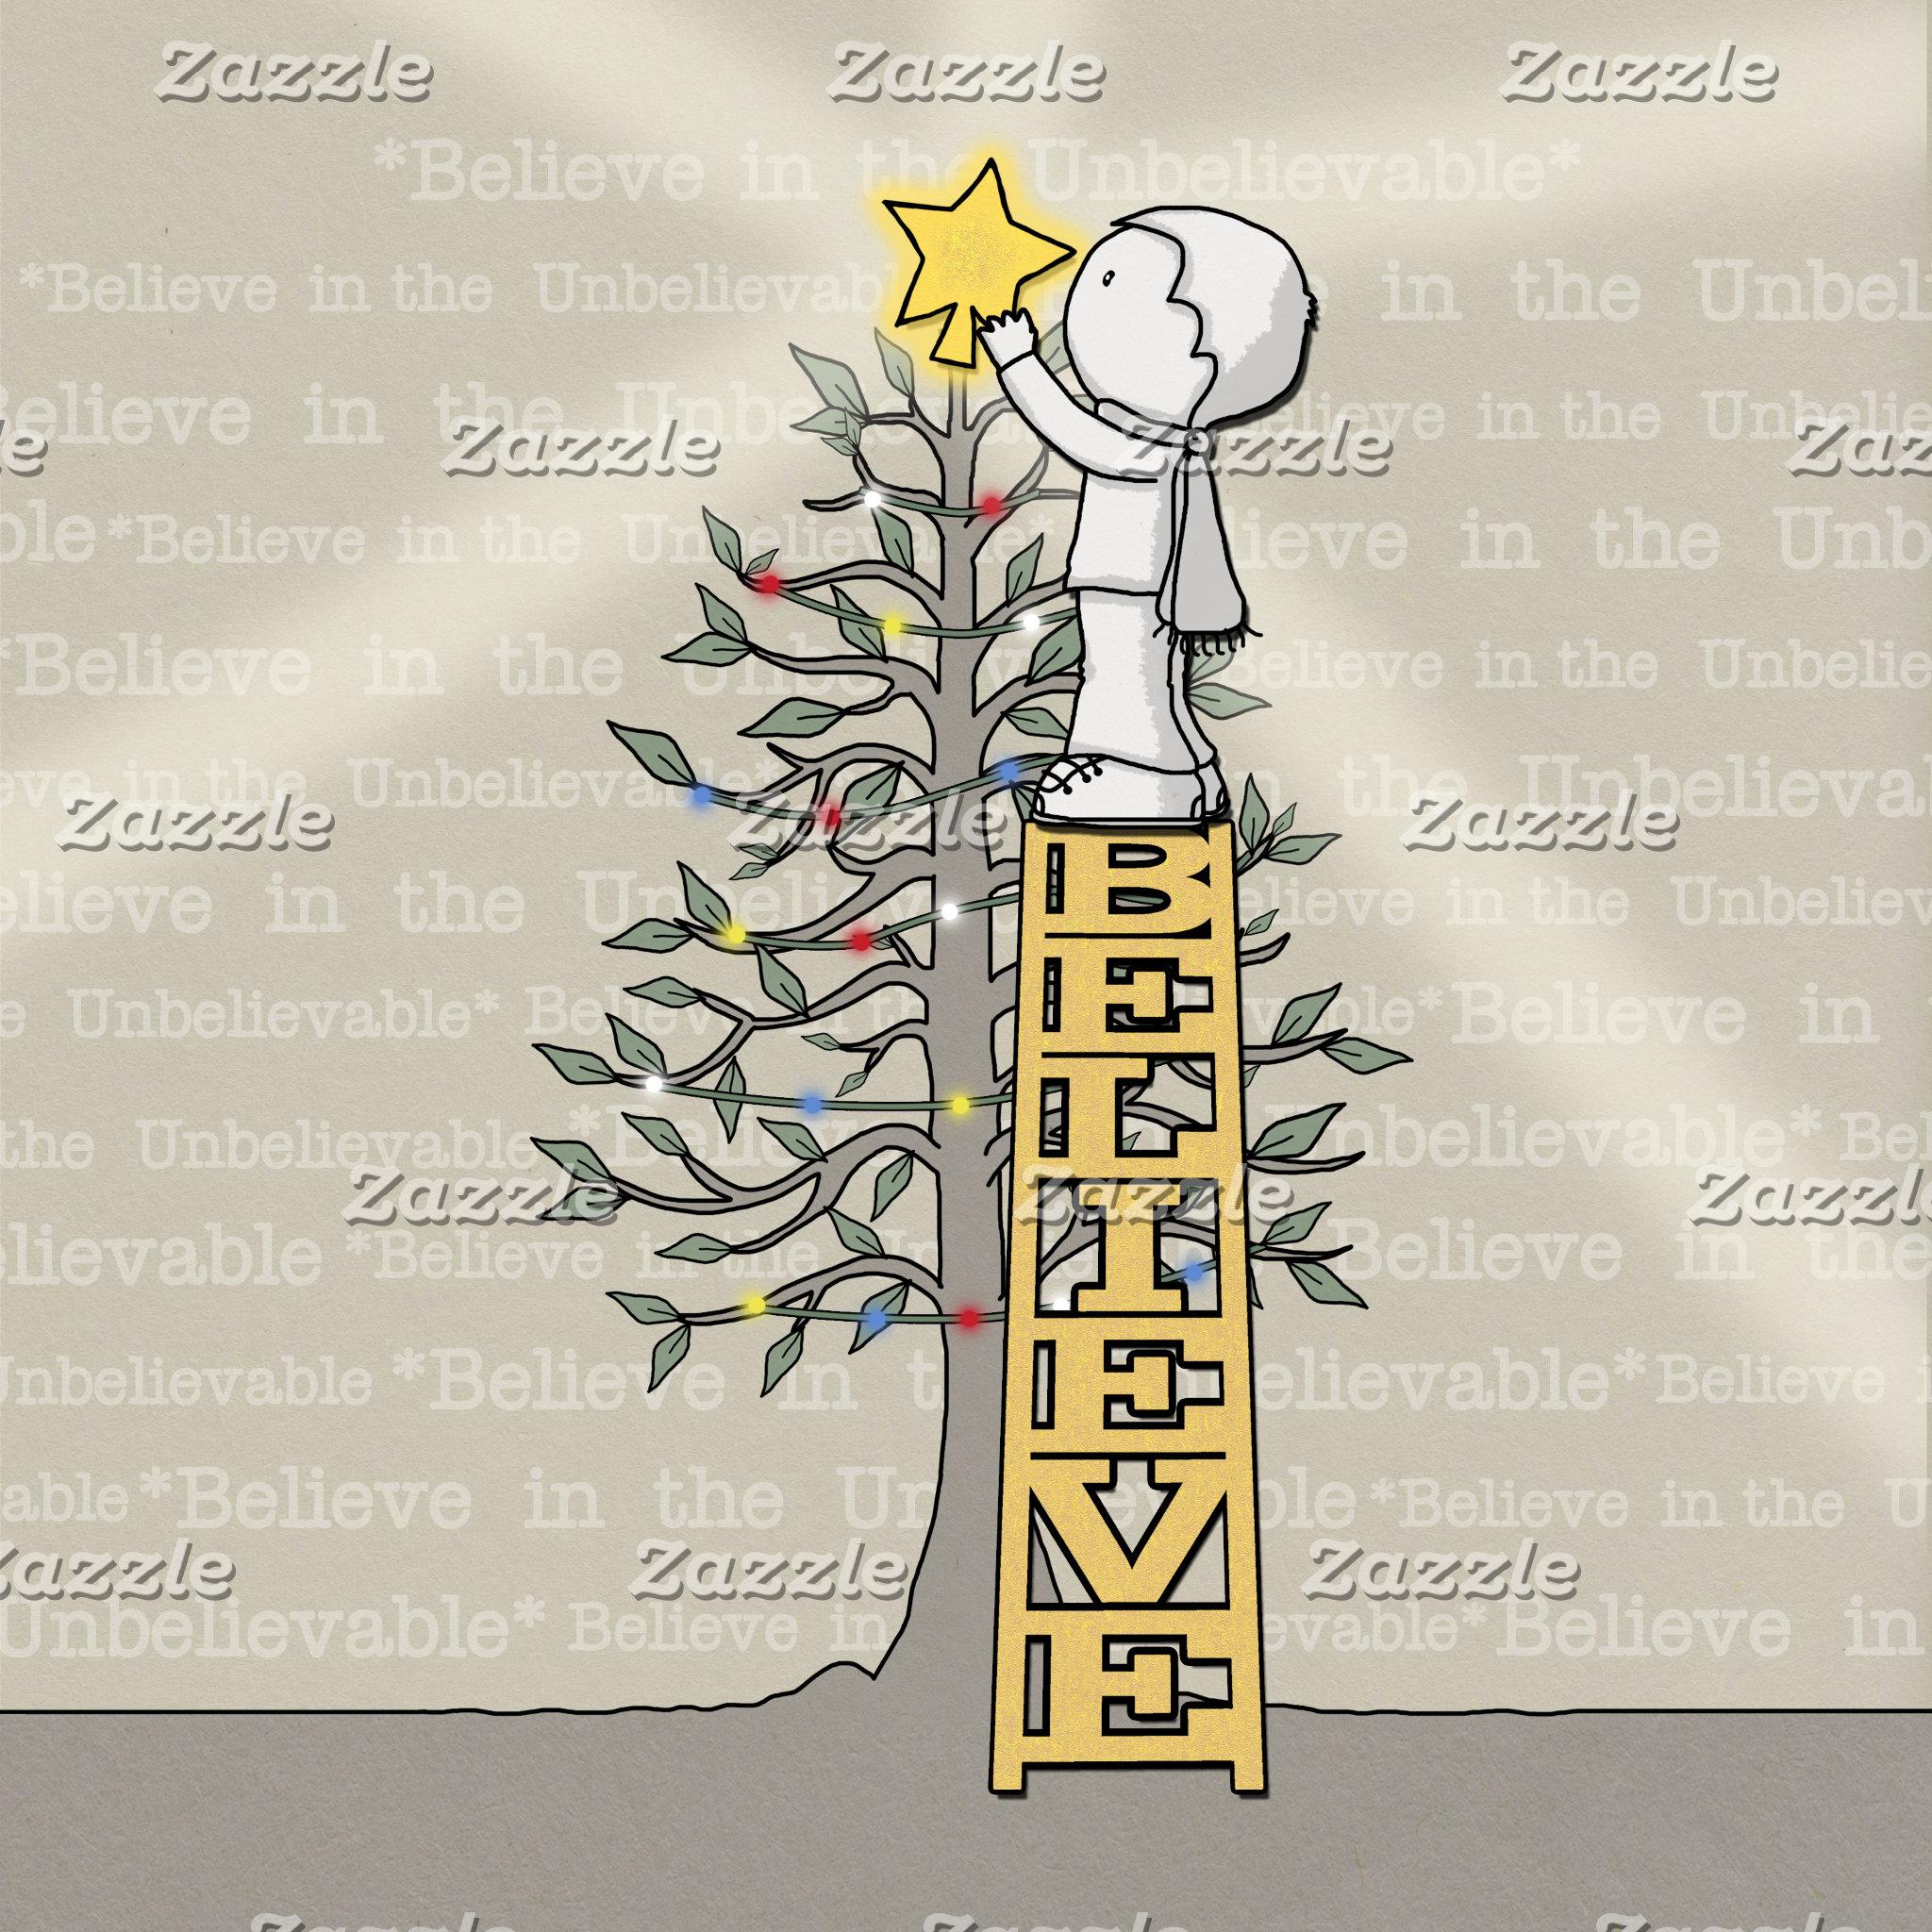 Believe Ladder -Christmas Tree